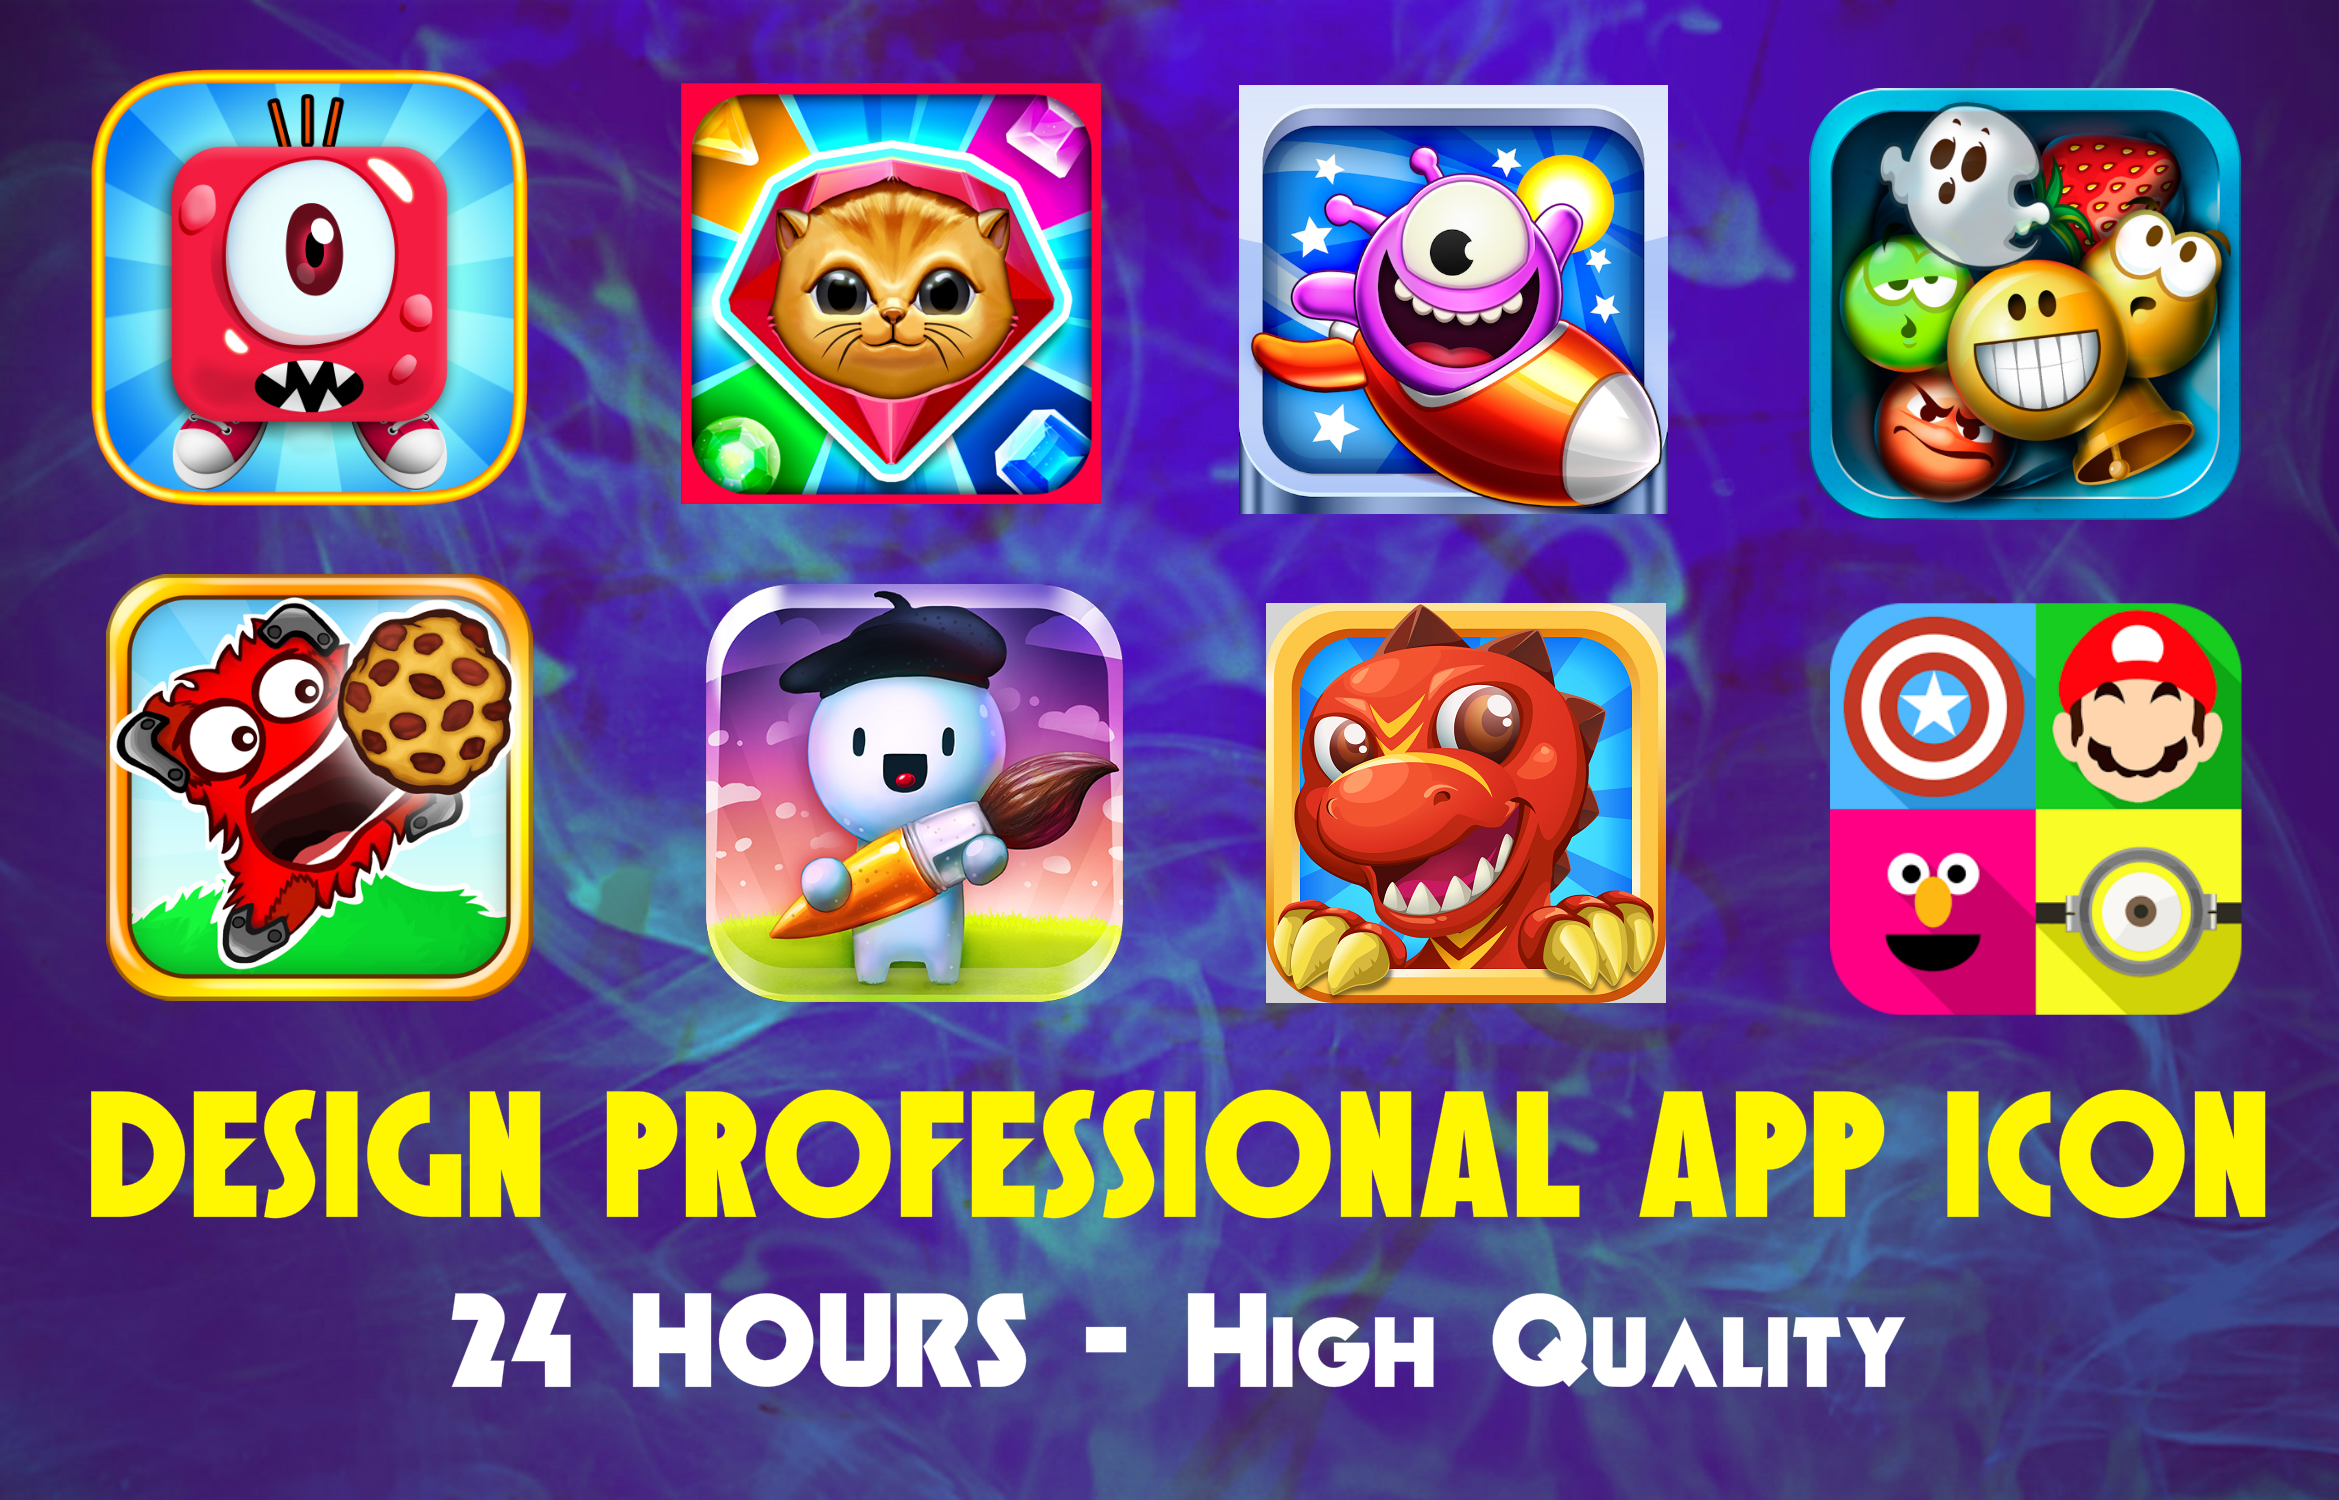 I will design Professional app icon in 24hour